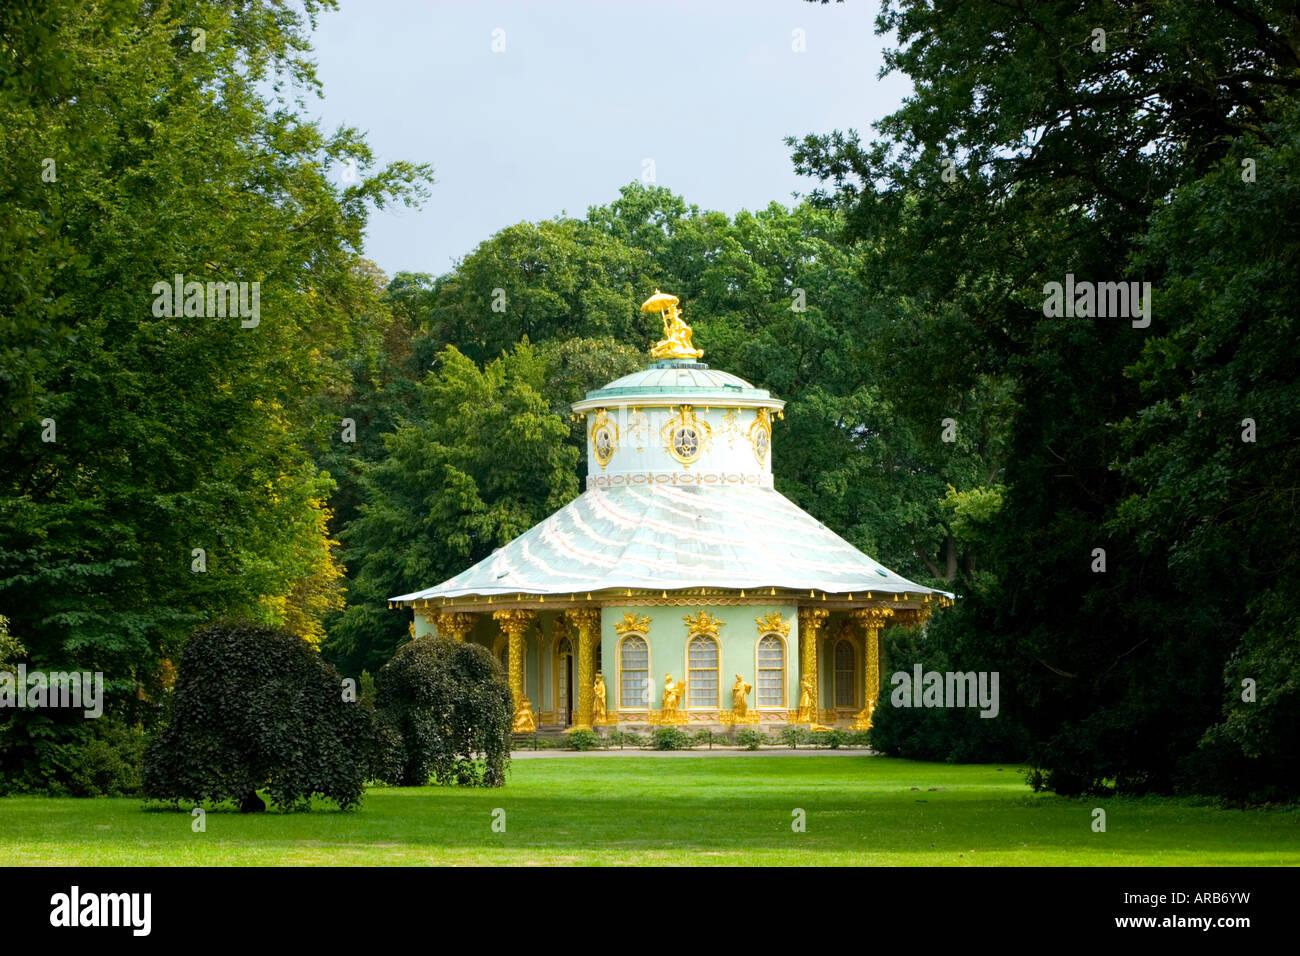 Chinese Tea House Park Sanssouci Potsdam Brandenburg Germany - Stock Image